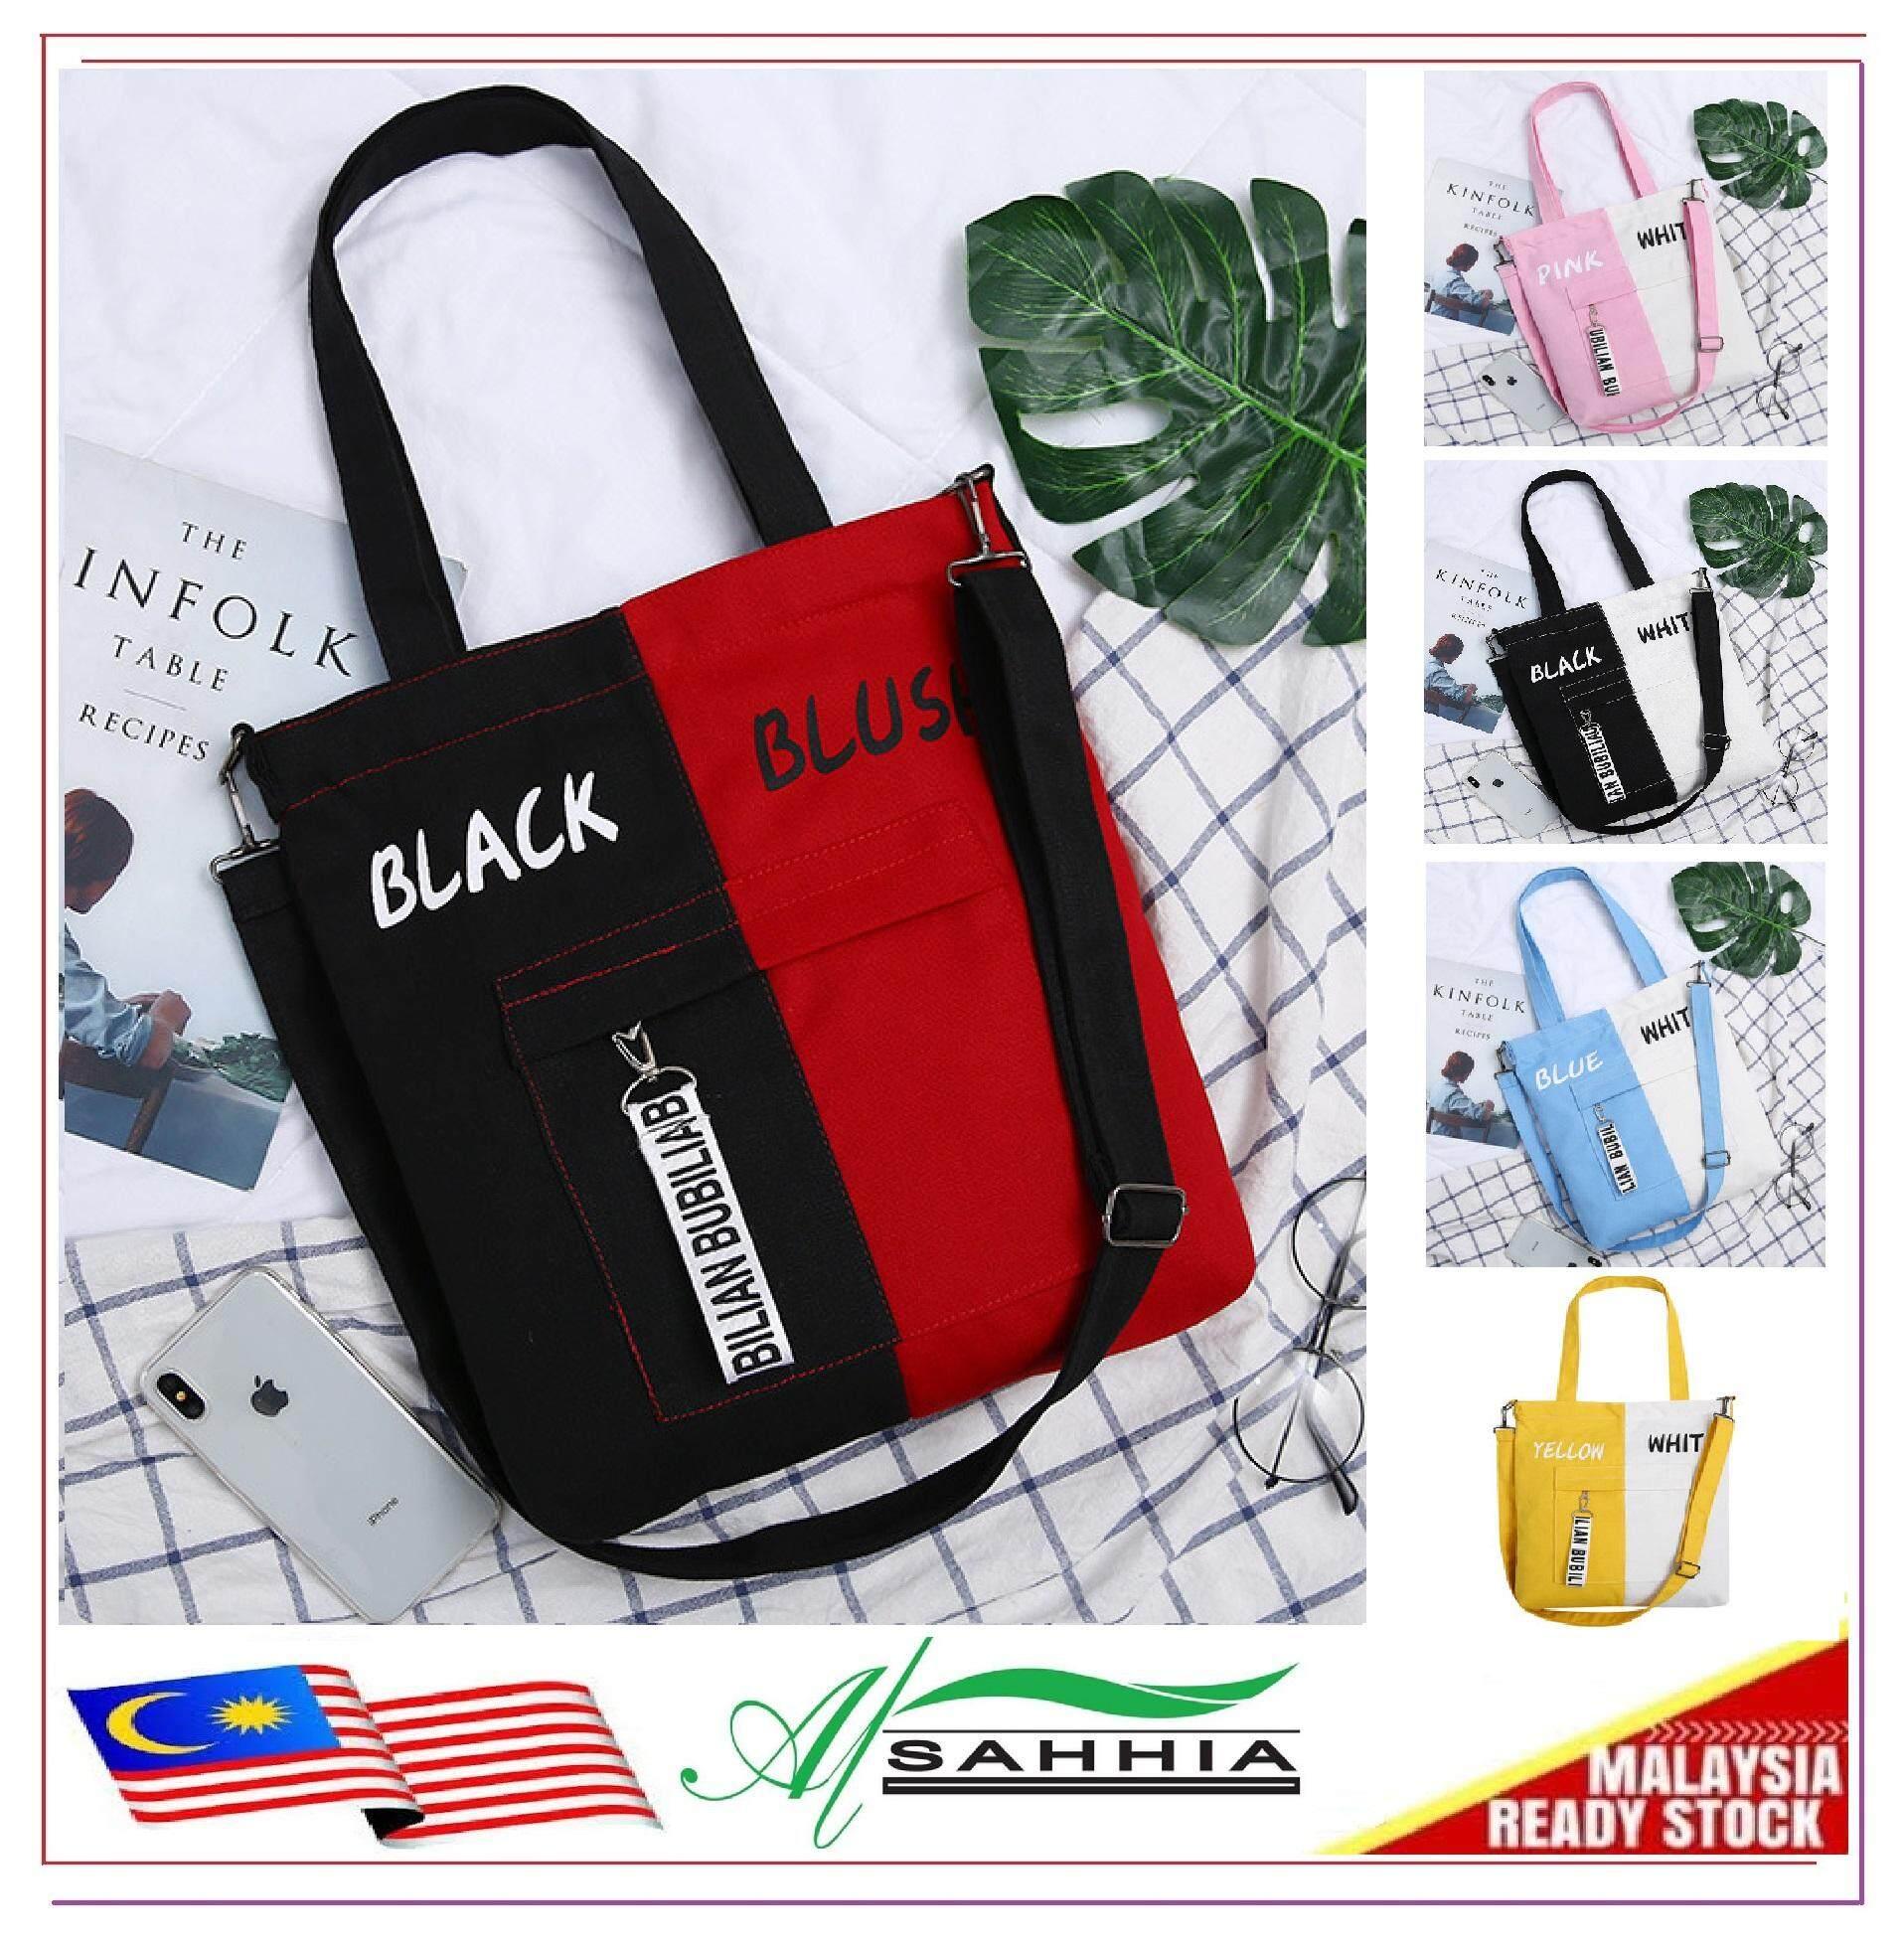 e4e44f331863 Latest Women s Bags Only on Lazada Malaysia!